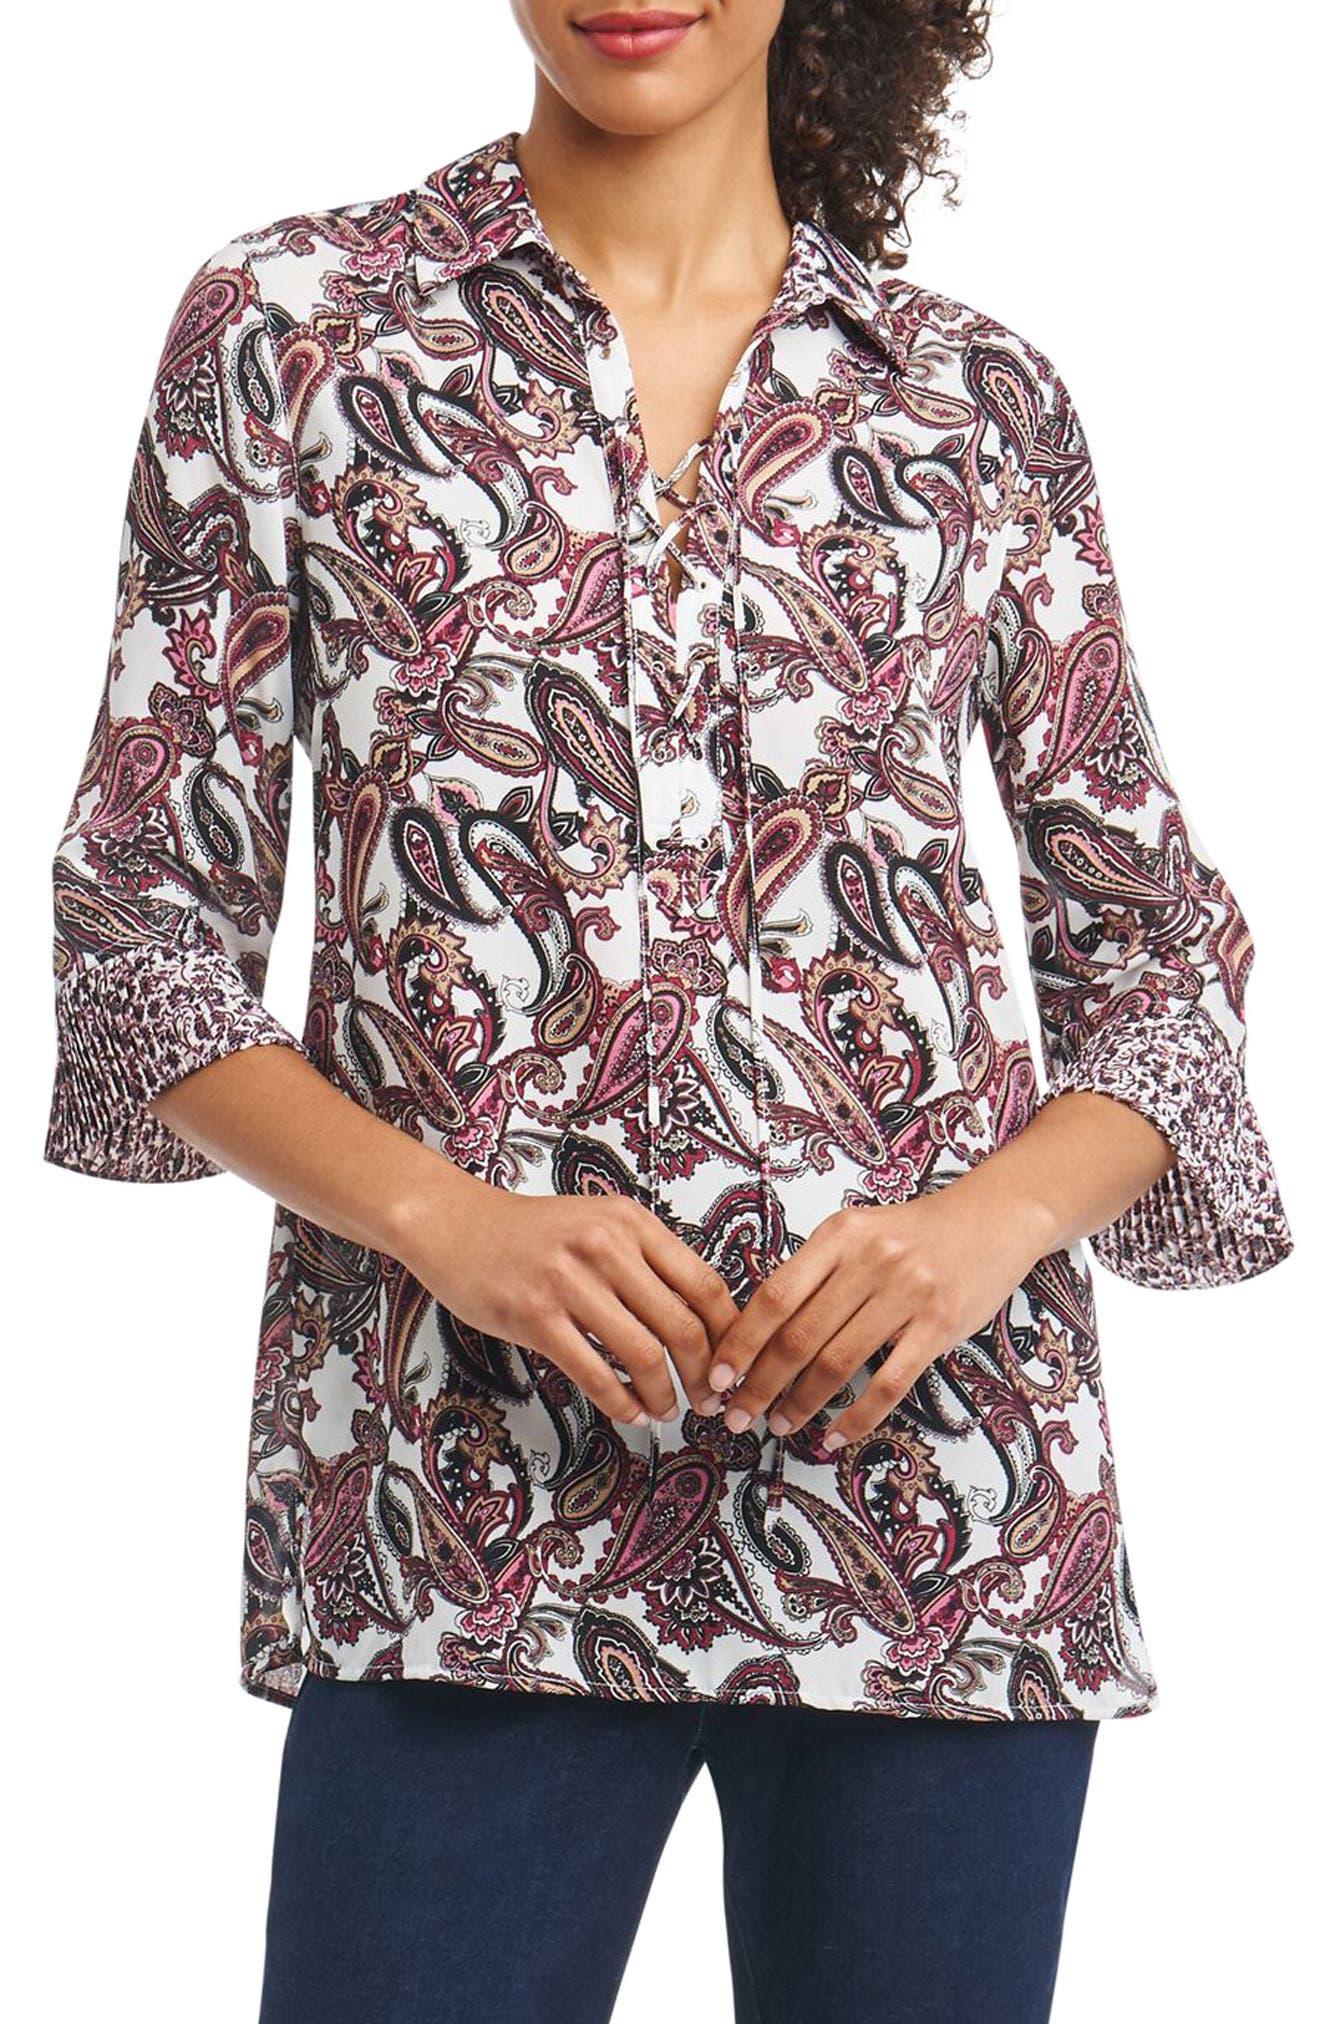 Main Image - Foxcroft Felicity Lace-Up Tunic Top (Regular & Petite)